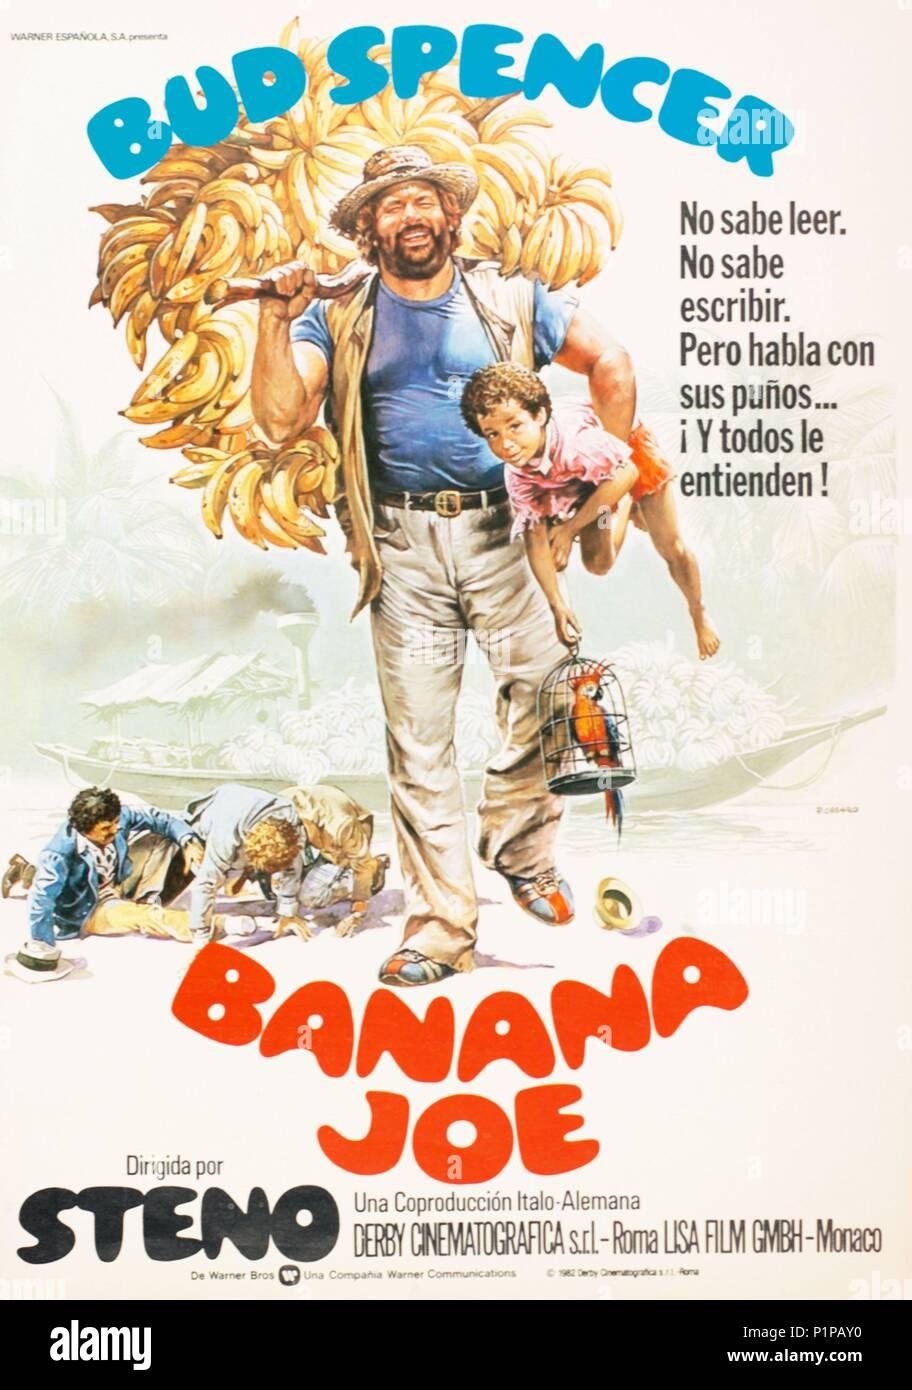 original-film-title-banana-joe-english-t